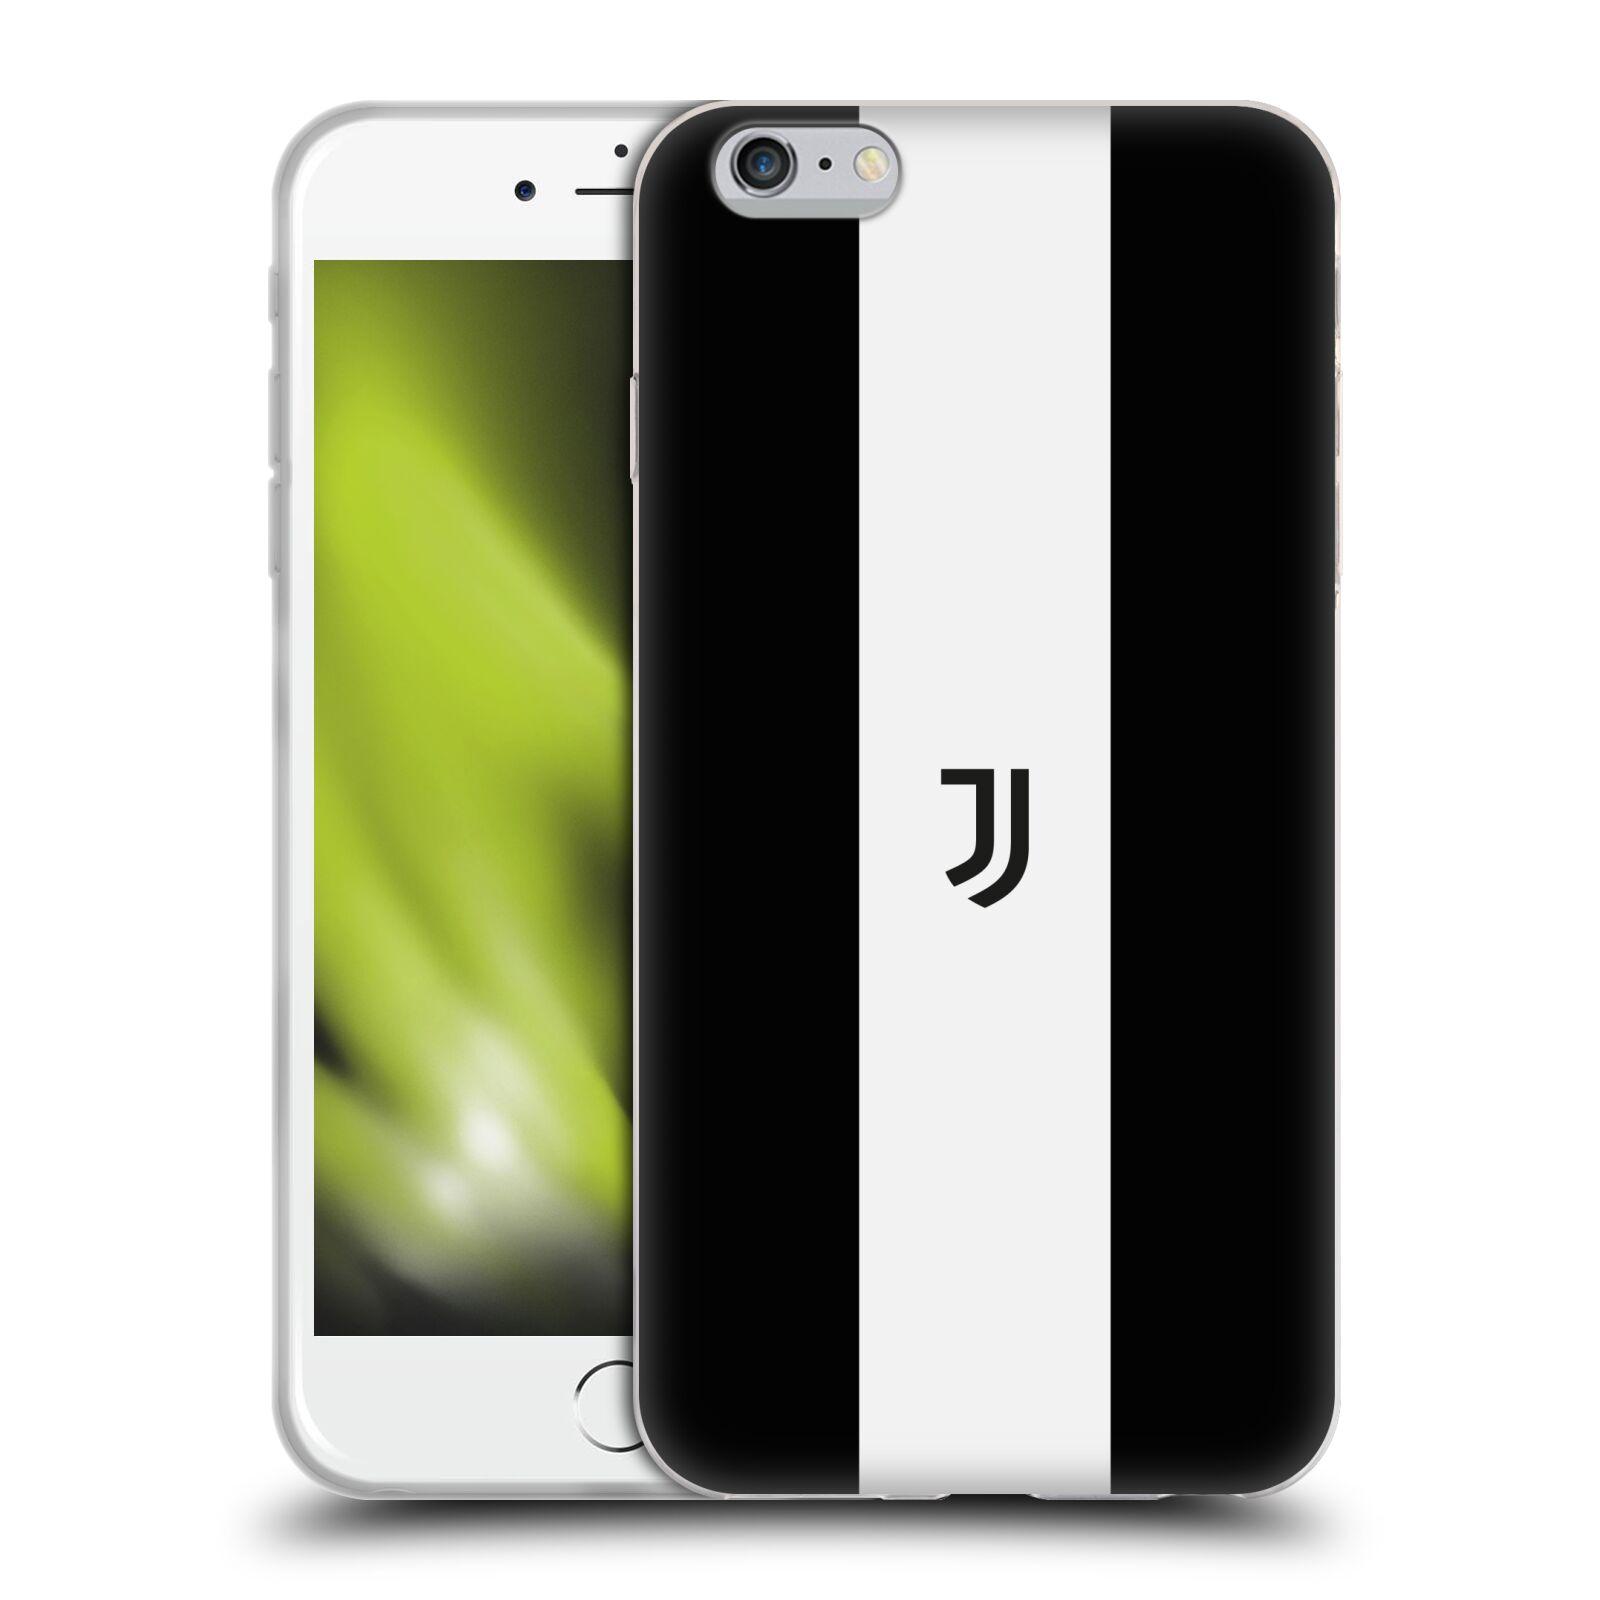 HEAD CASE silikonový obal na mobil Apple Iphone 6/6S PLUS Fotbalový klub Juventus FC pruhy znak černá a bílá